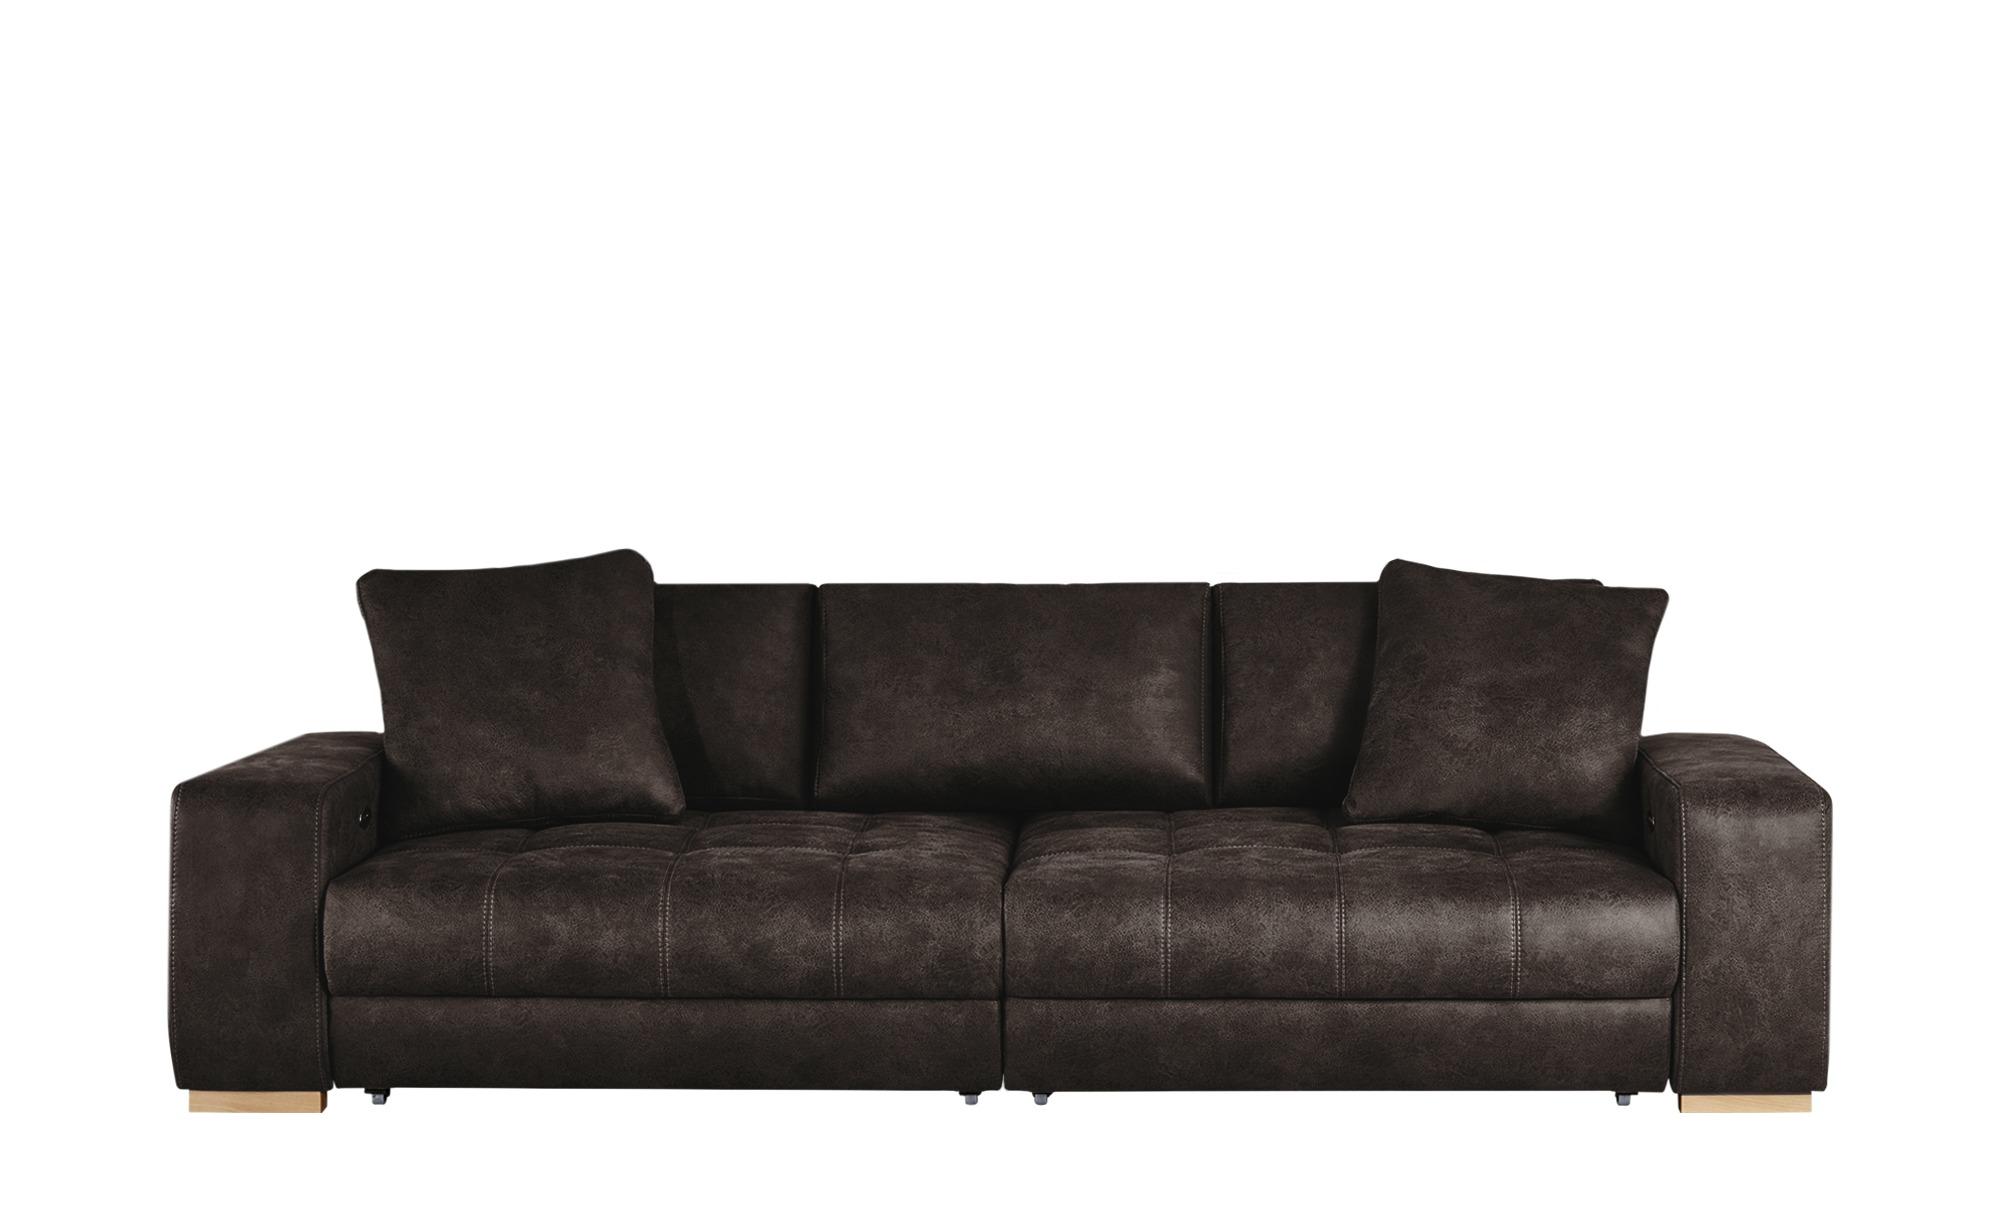 bobb Big Sofa dunkelbraun - Microfaser Caro ¦ braun ¦ Maße (cm): B: 302 H: 68 T: 136 Polstermöbel > Sofas > Big-Sofas - Höffner